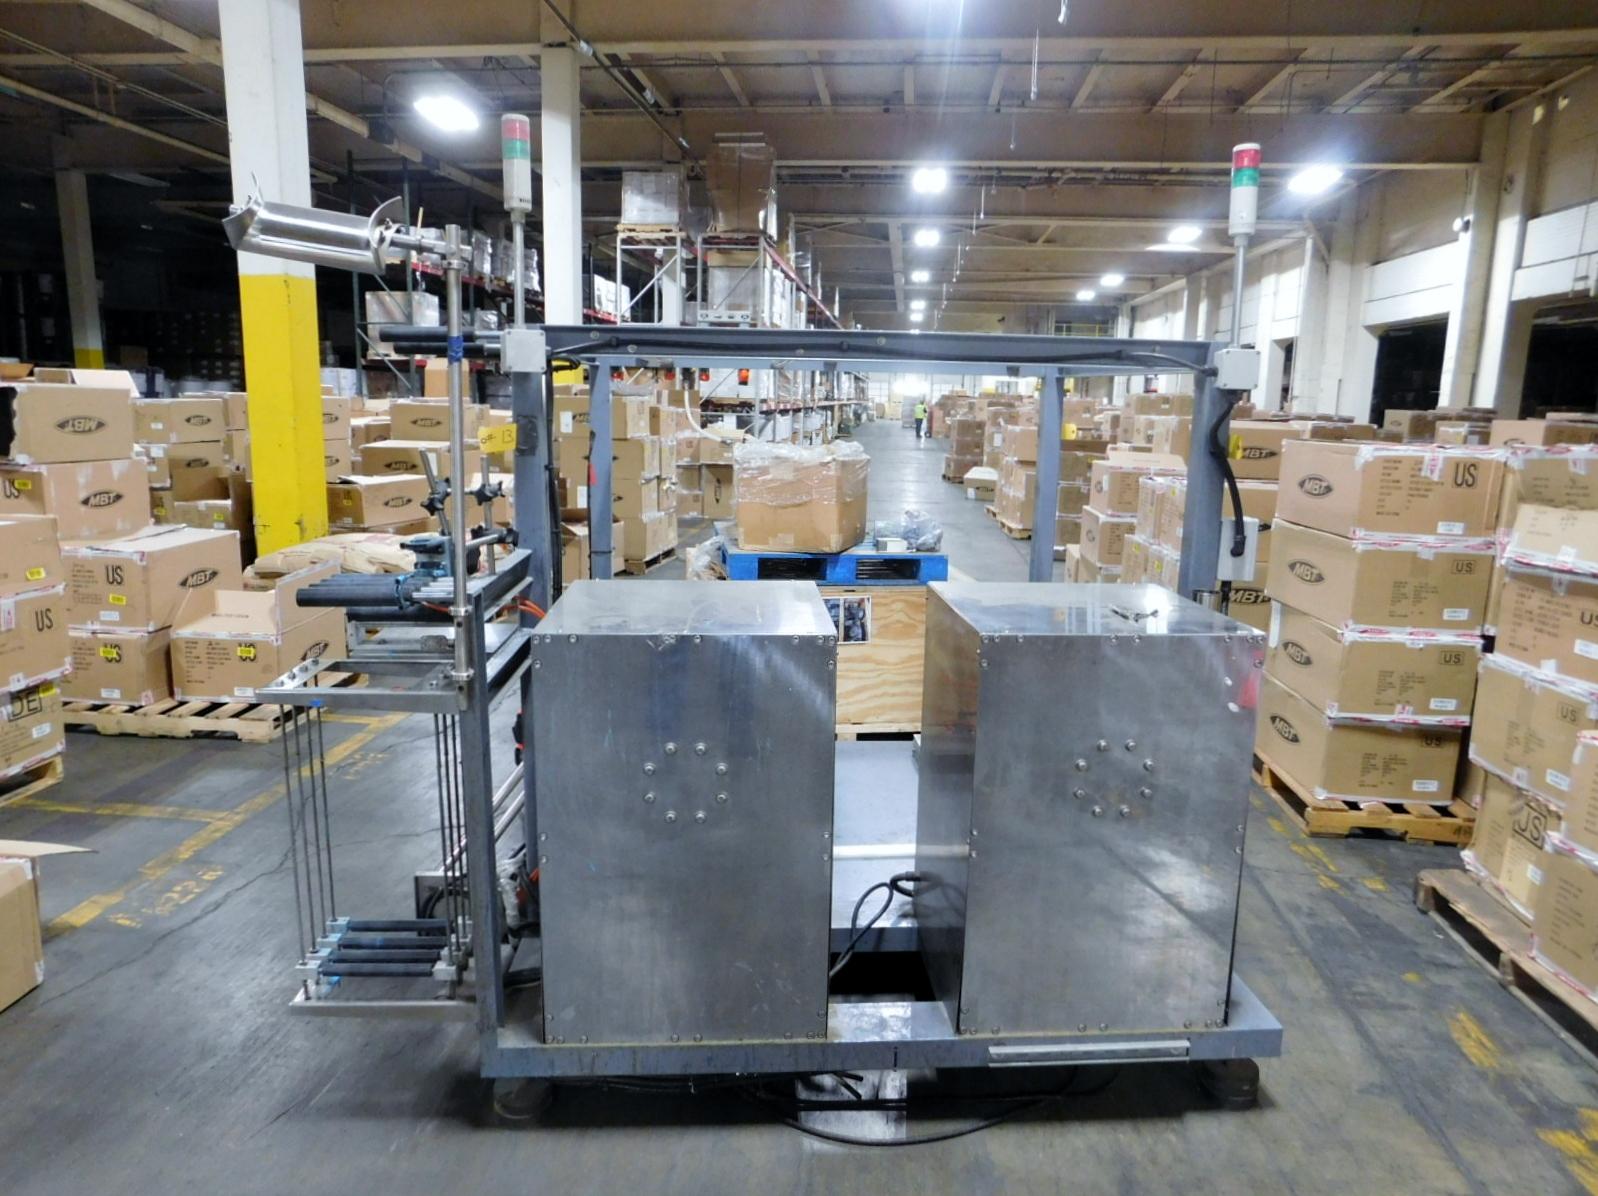 Lot 13 - Sleever Acumalator Sleeve Dispense Sleeve dispenser WITH 2 EBJ AIRSHAFTS Clark Logistic Services |